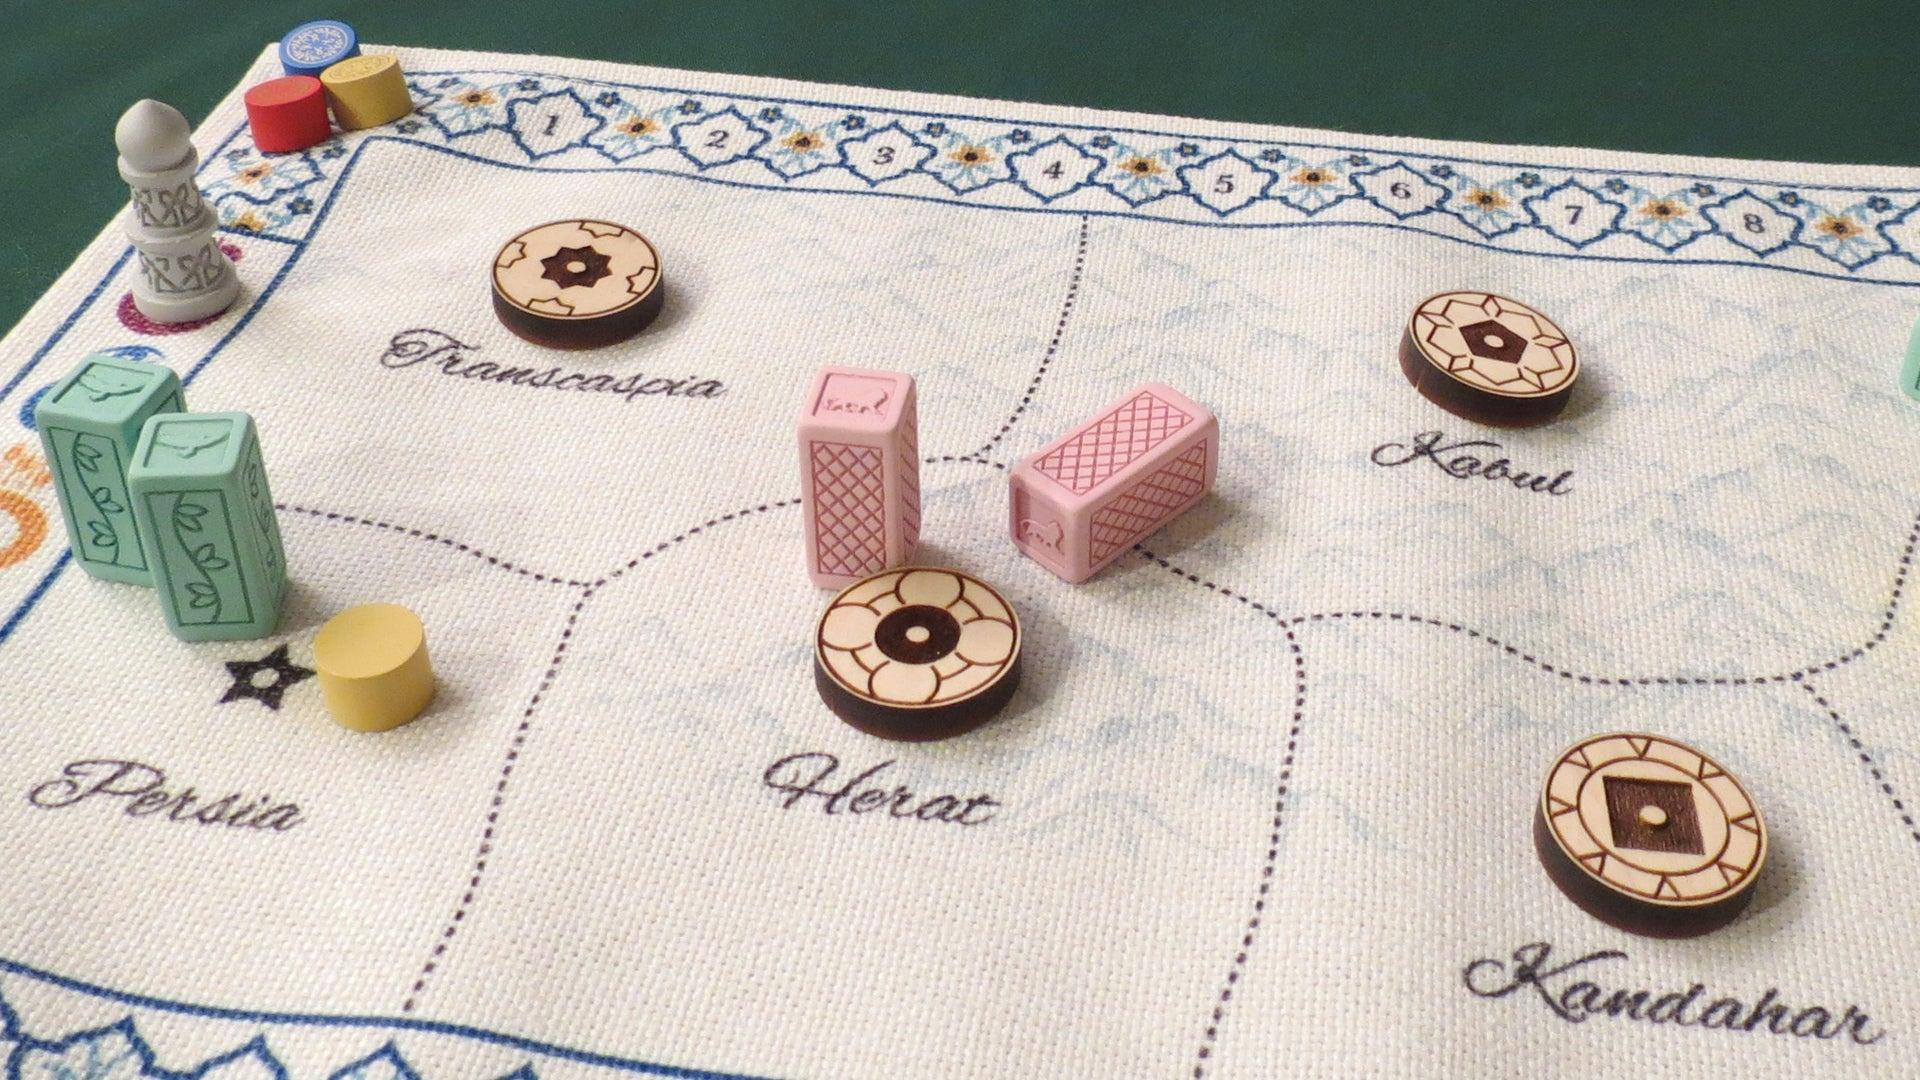 Pax Pamir 2E board game gameplay